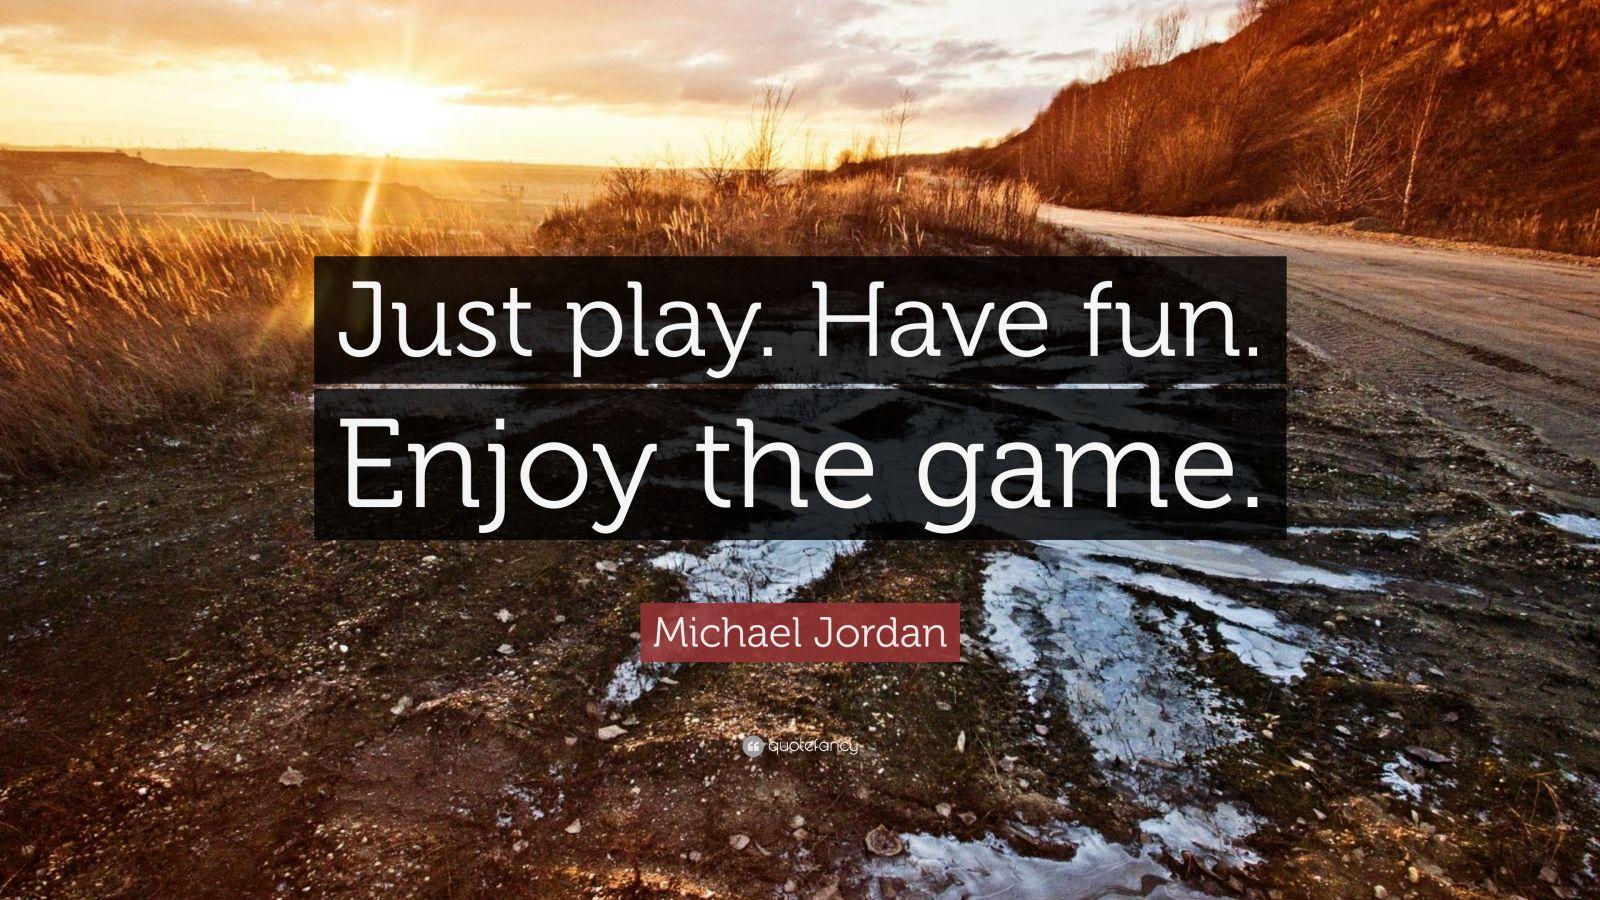 michael jordan quote   u201cjust play  have fun  enjoy the game